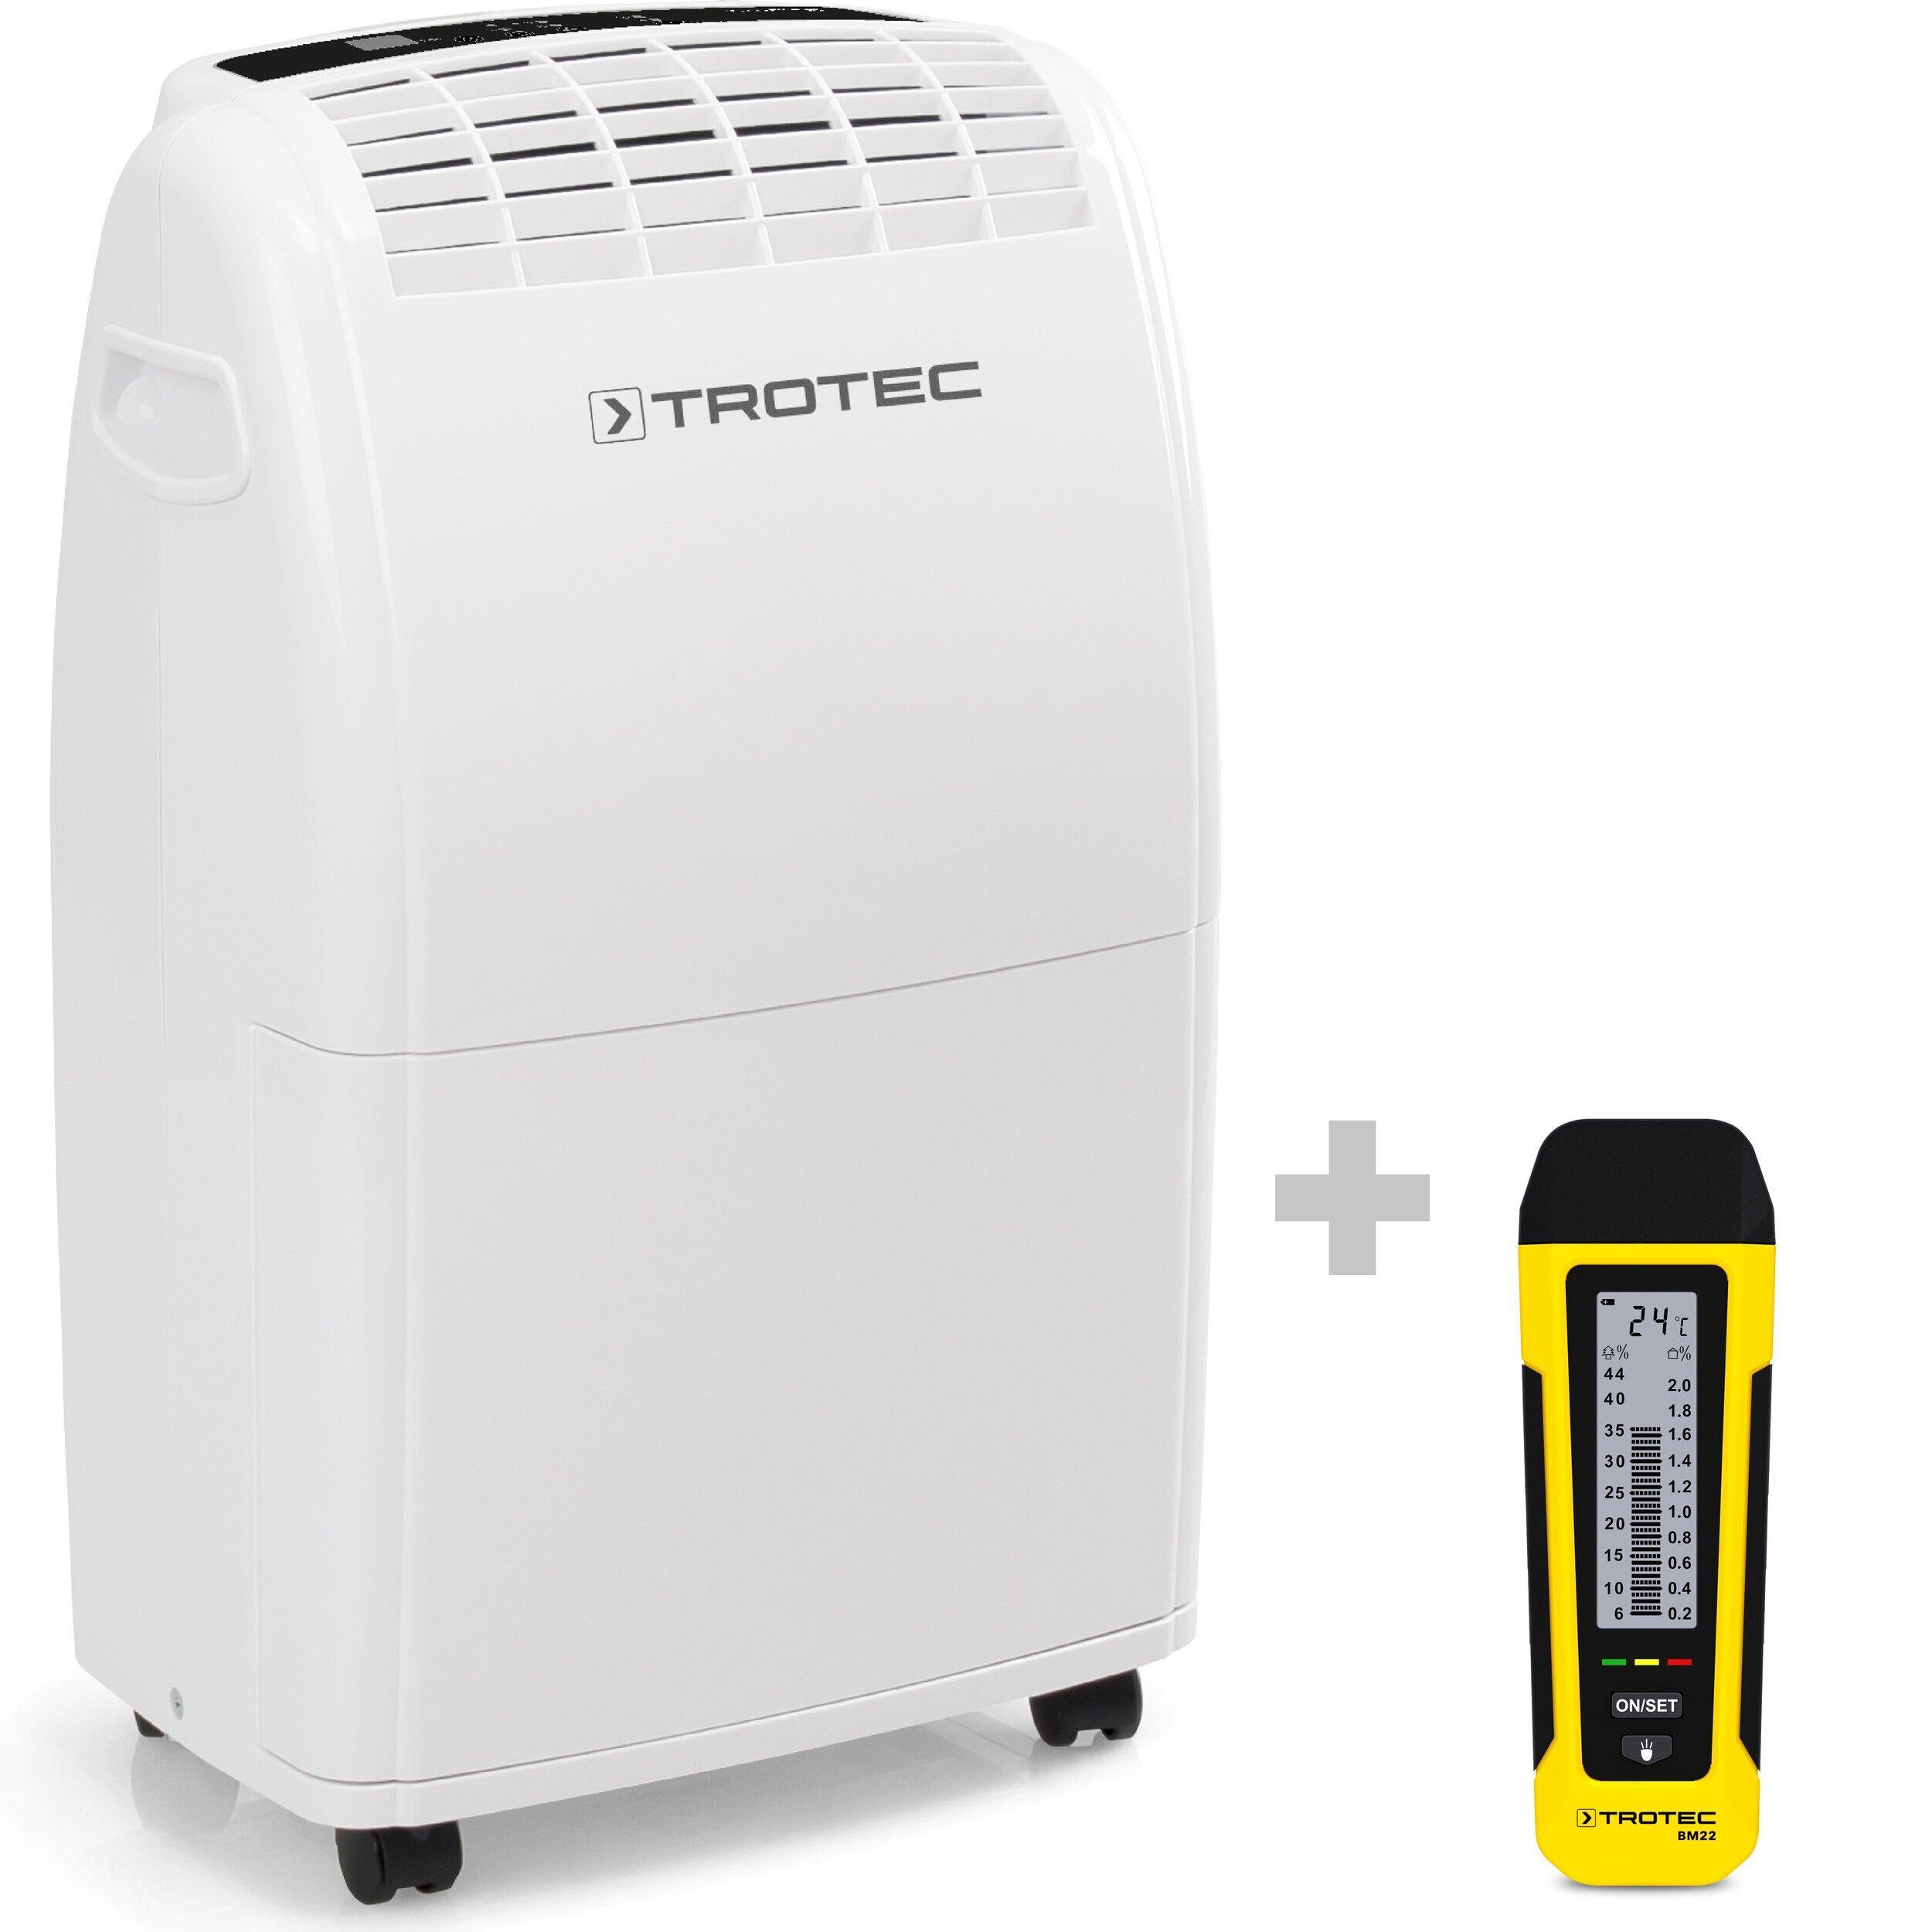 trotec deumidificatore ttk 75 e + indicatore di umidità bm22